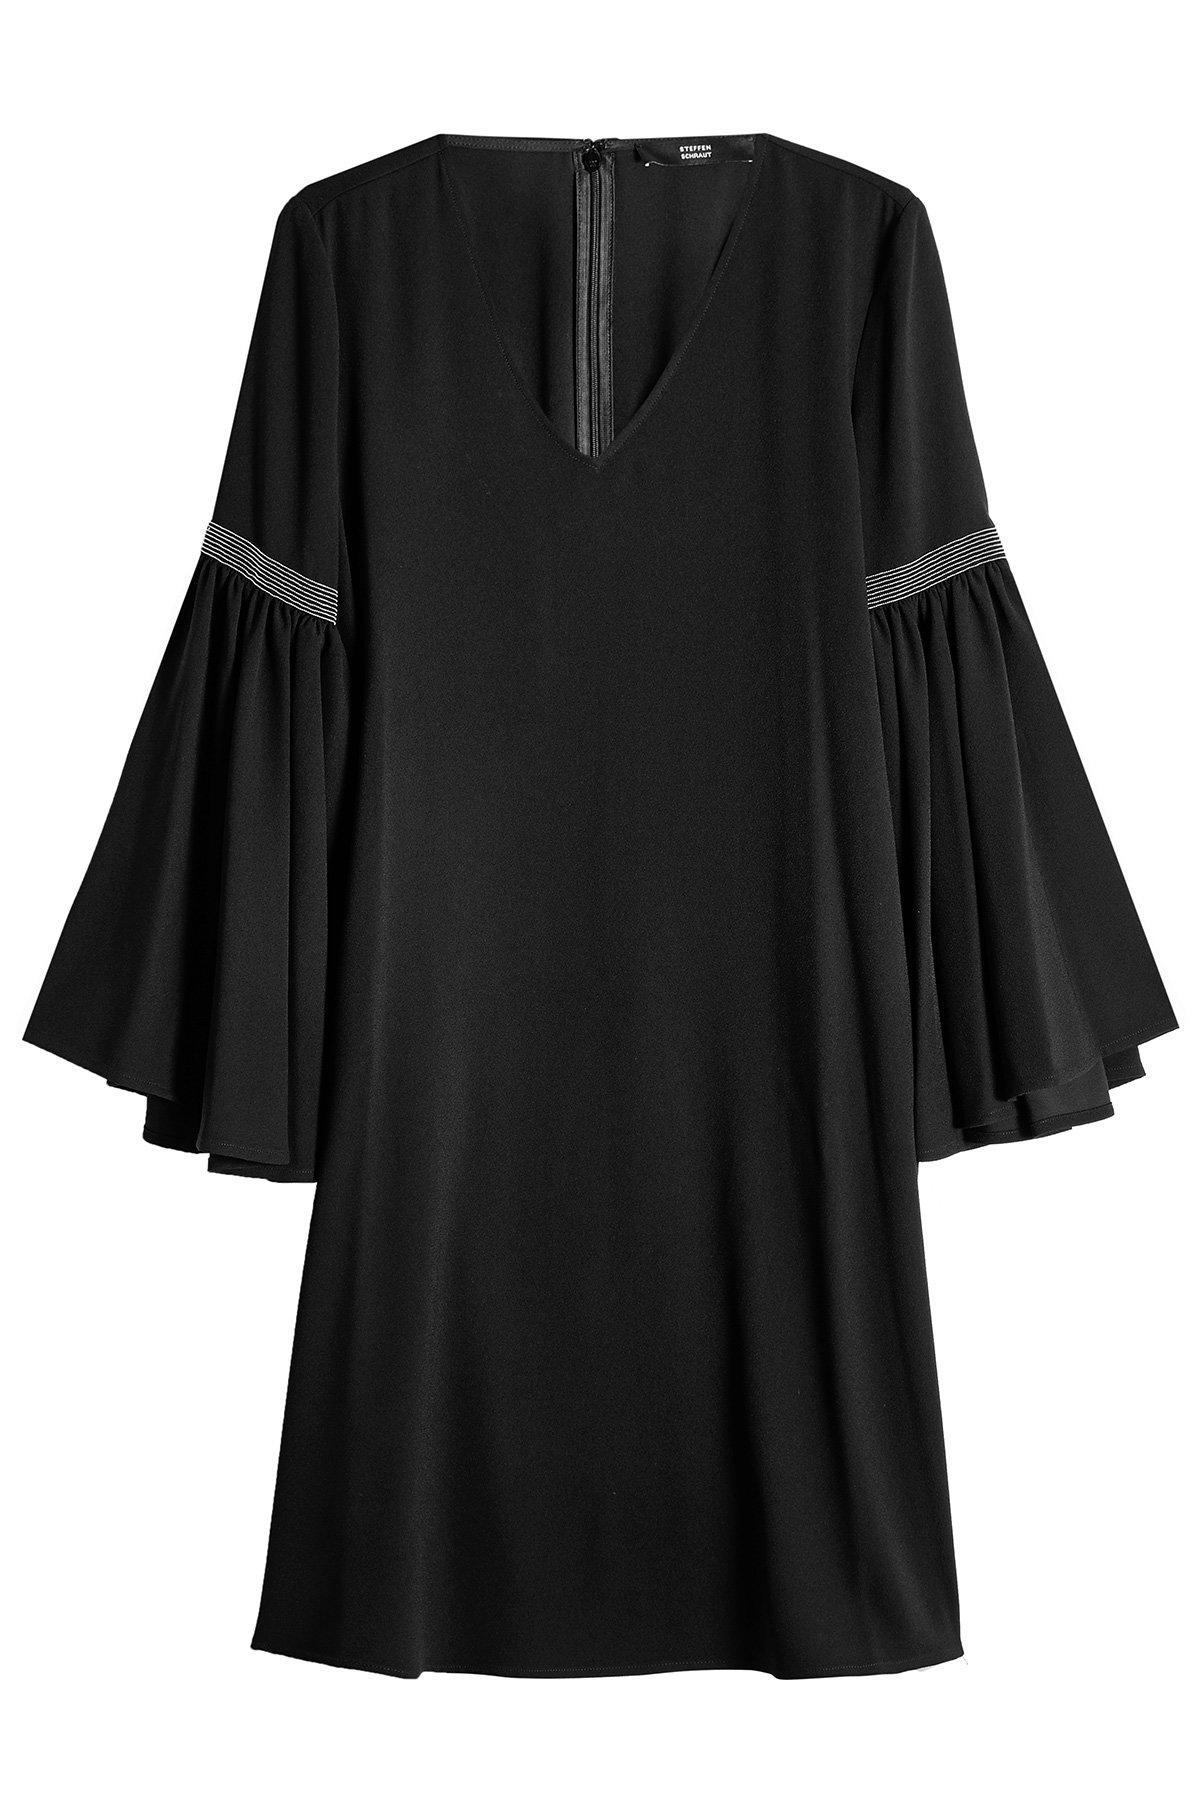 Steffen Schraut Crepe Dress With Embellishment In Black